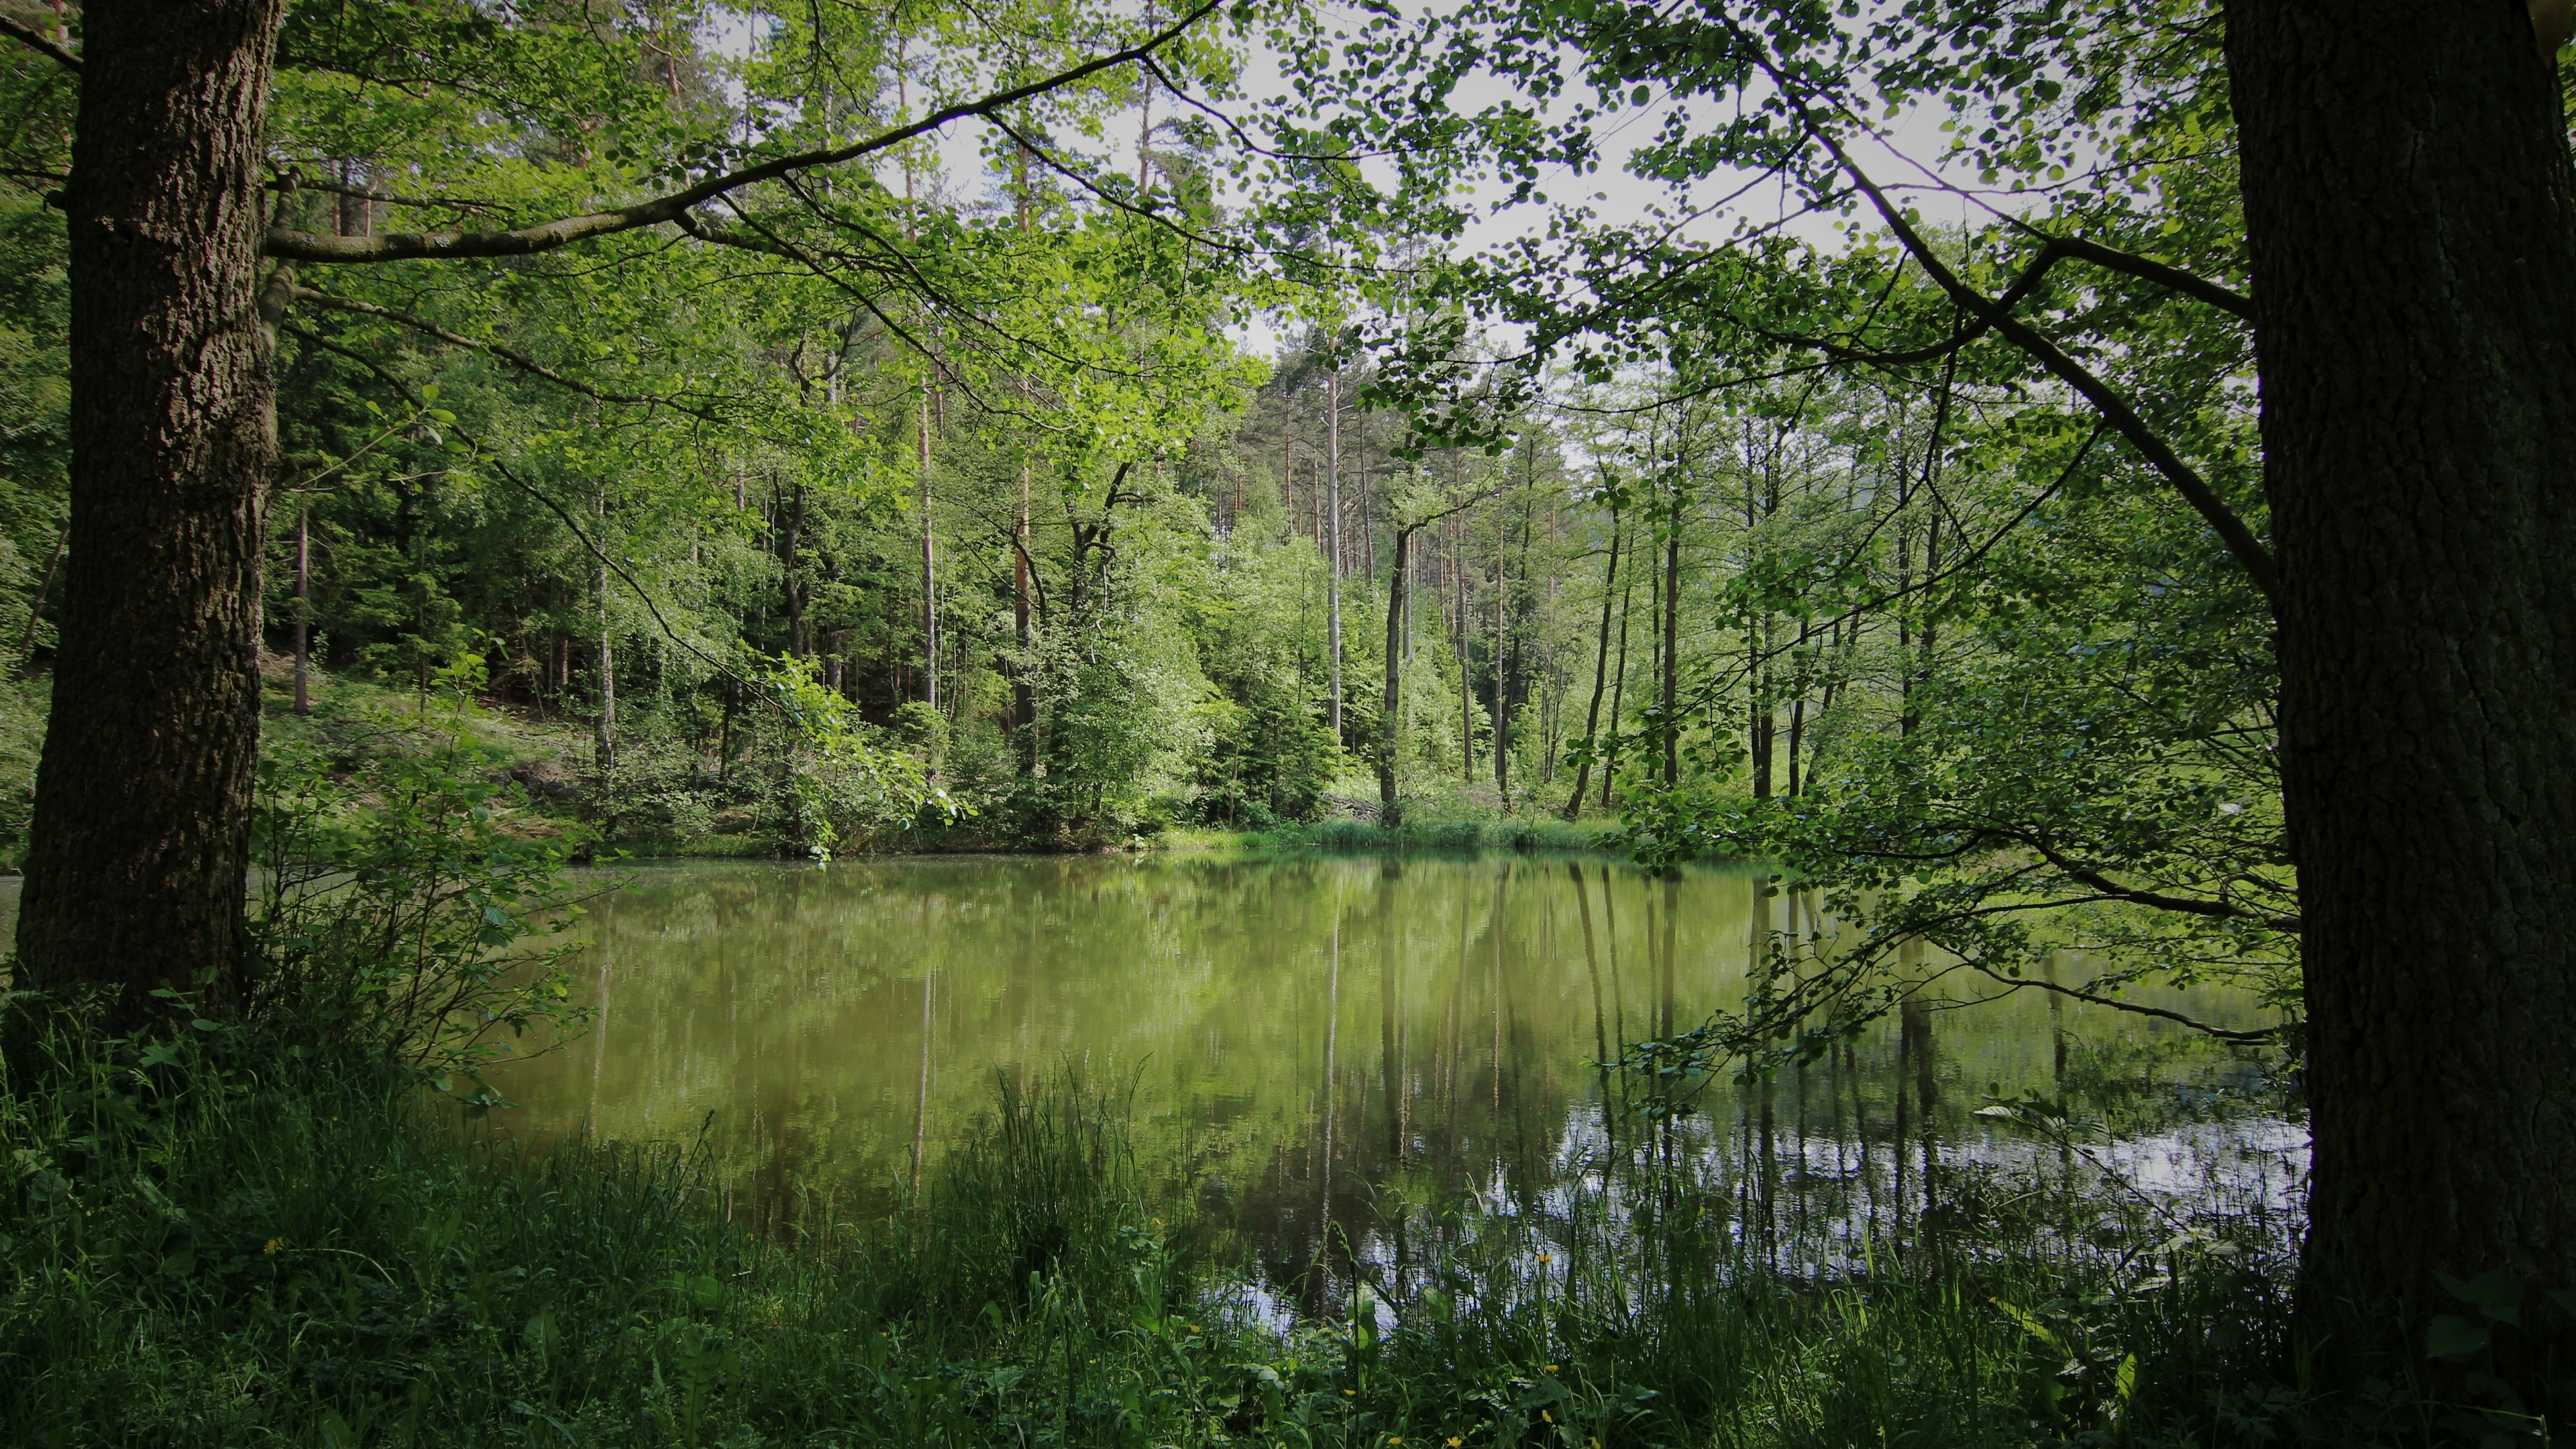 Geschwenda, Geratal, Thuringia, Germany